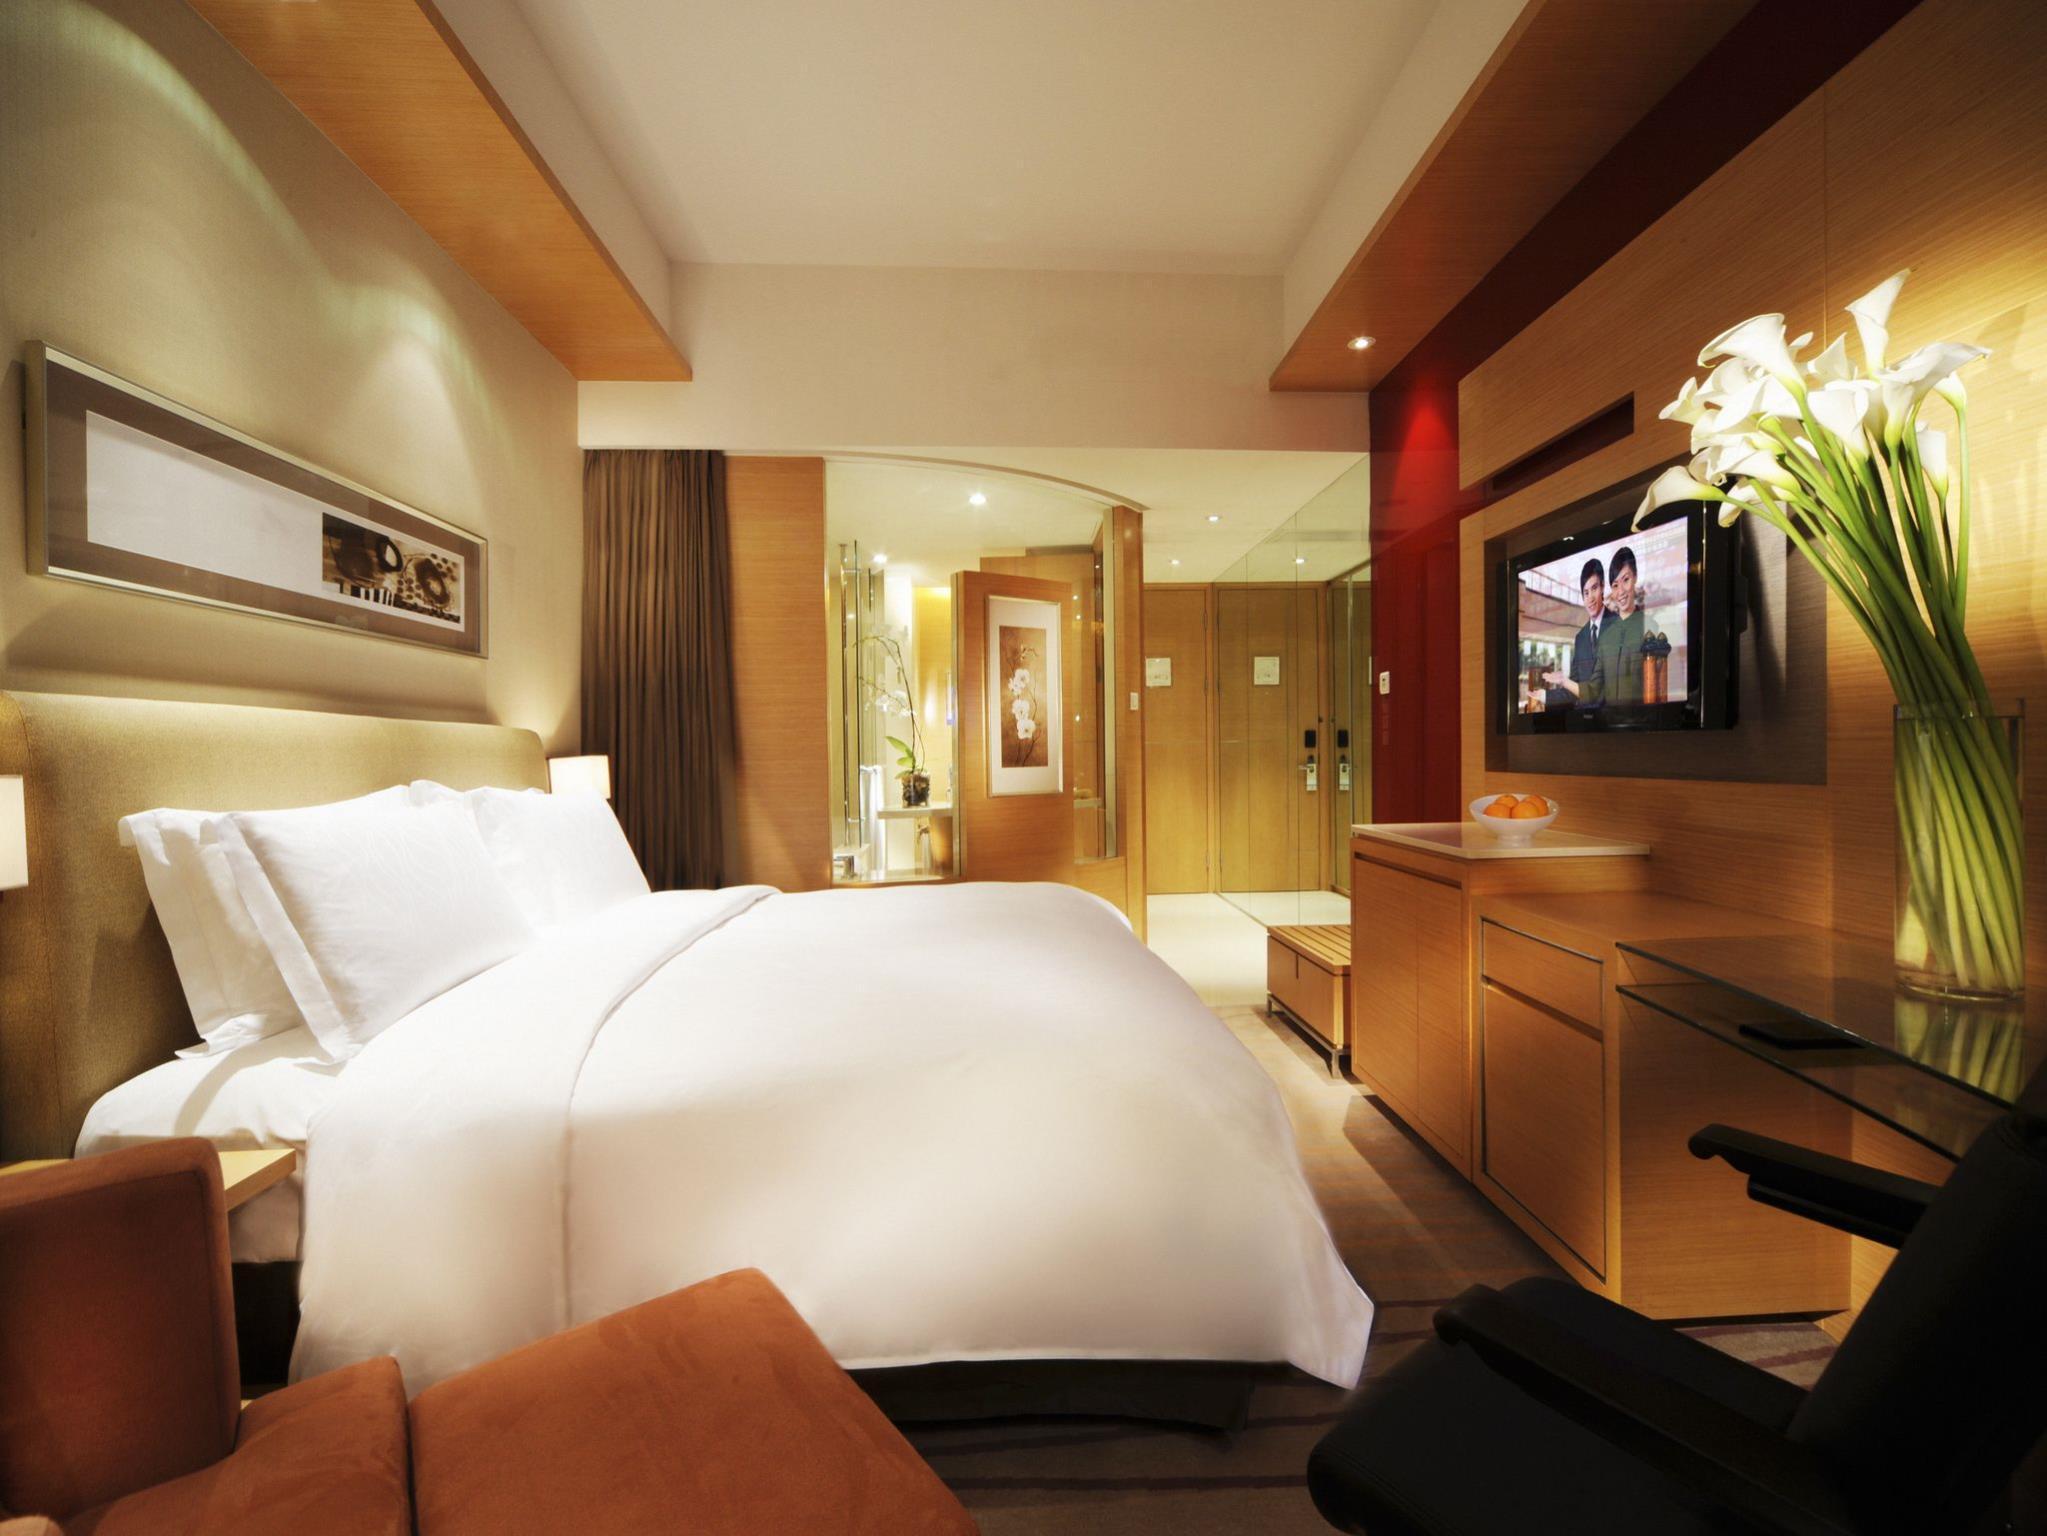 New World Wuhan Hotel Wuhan China